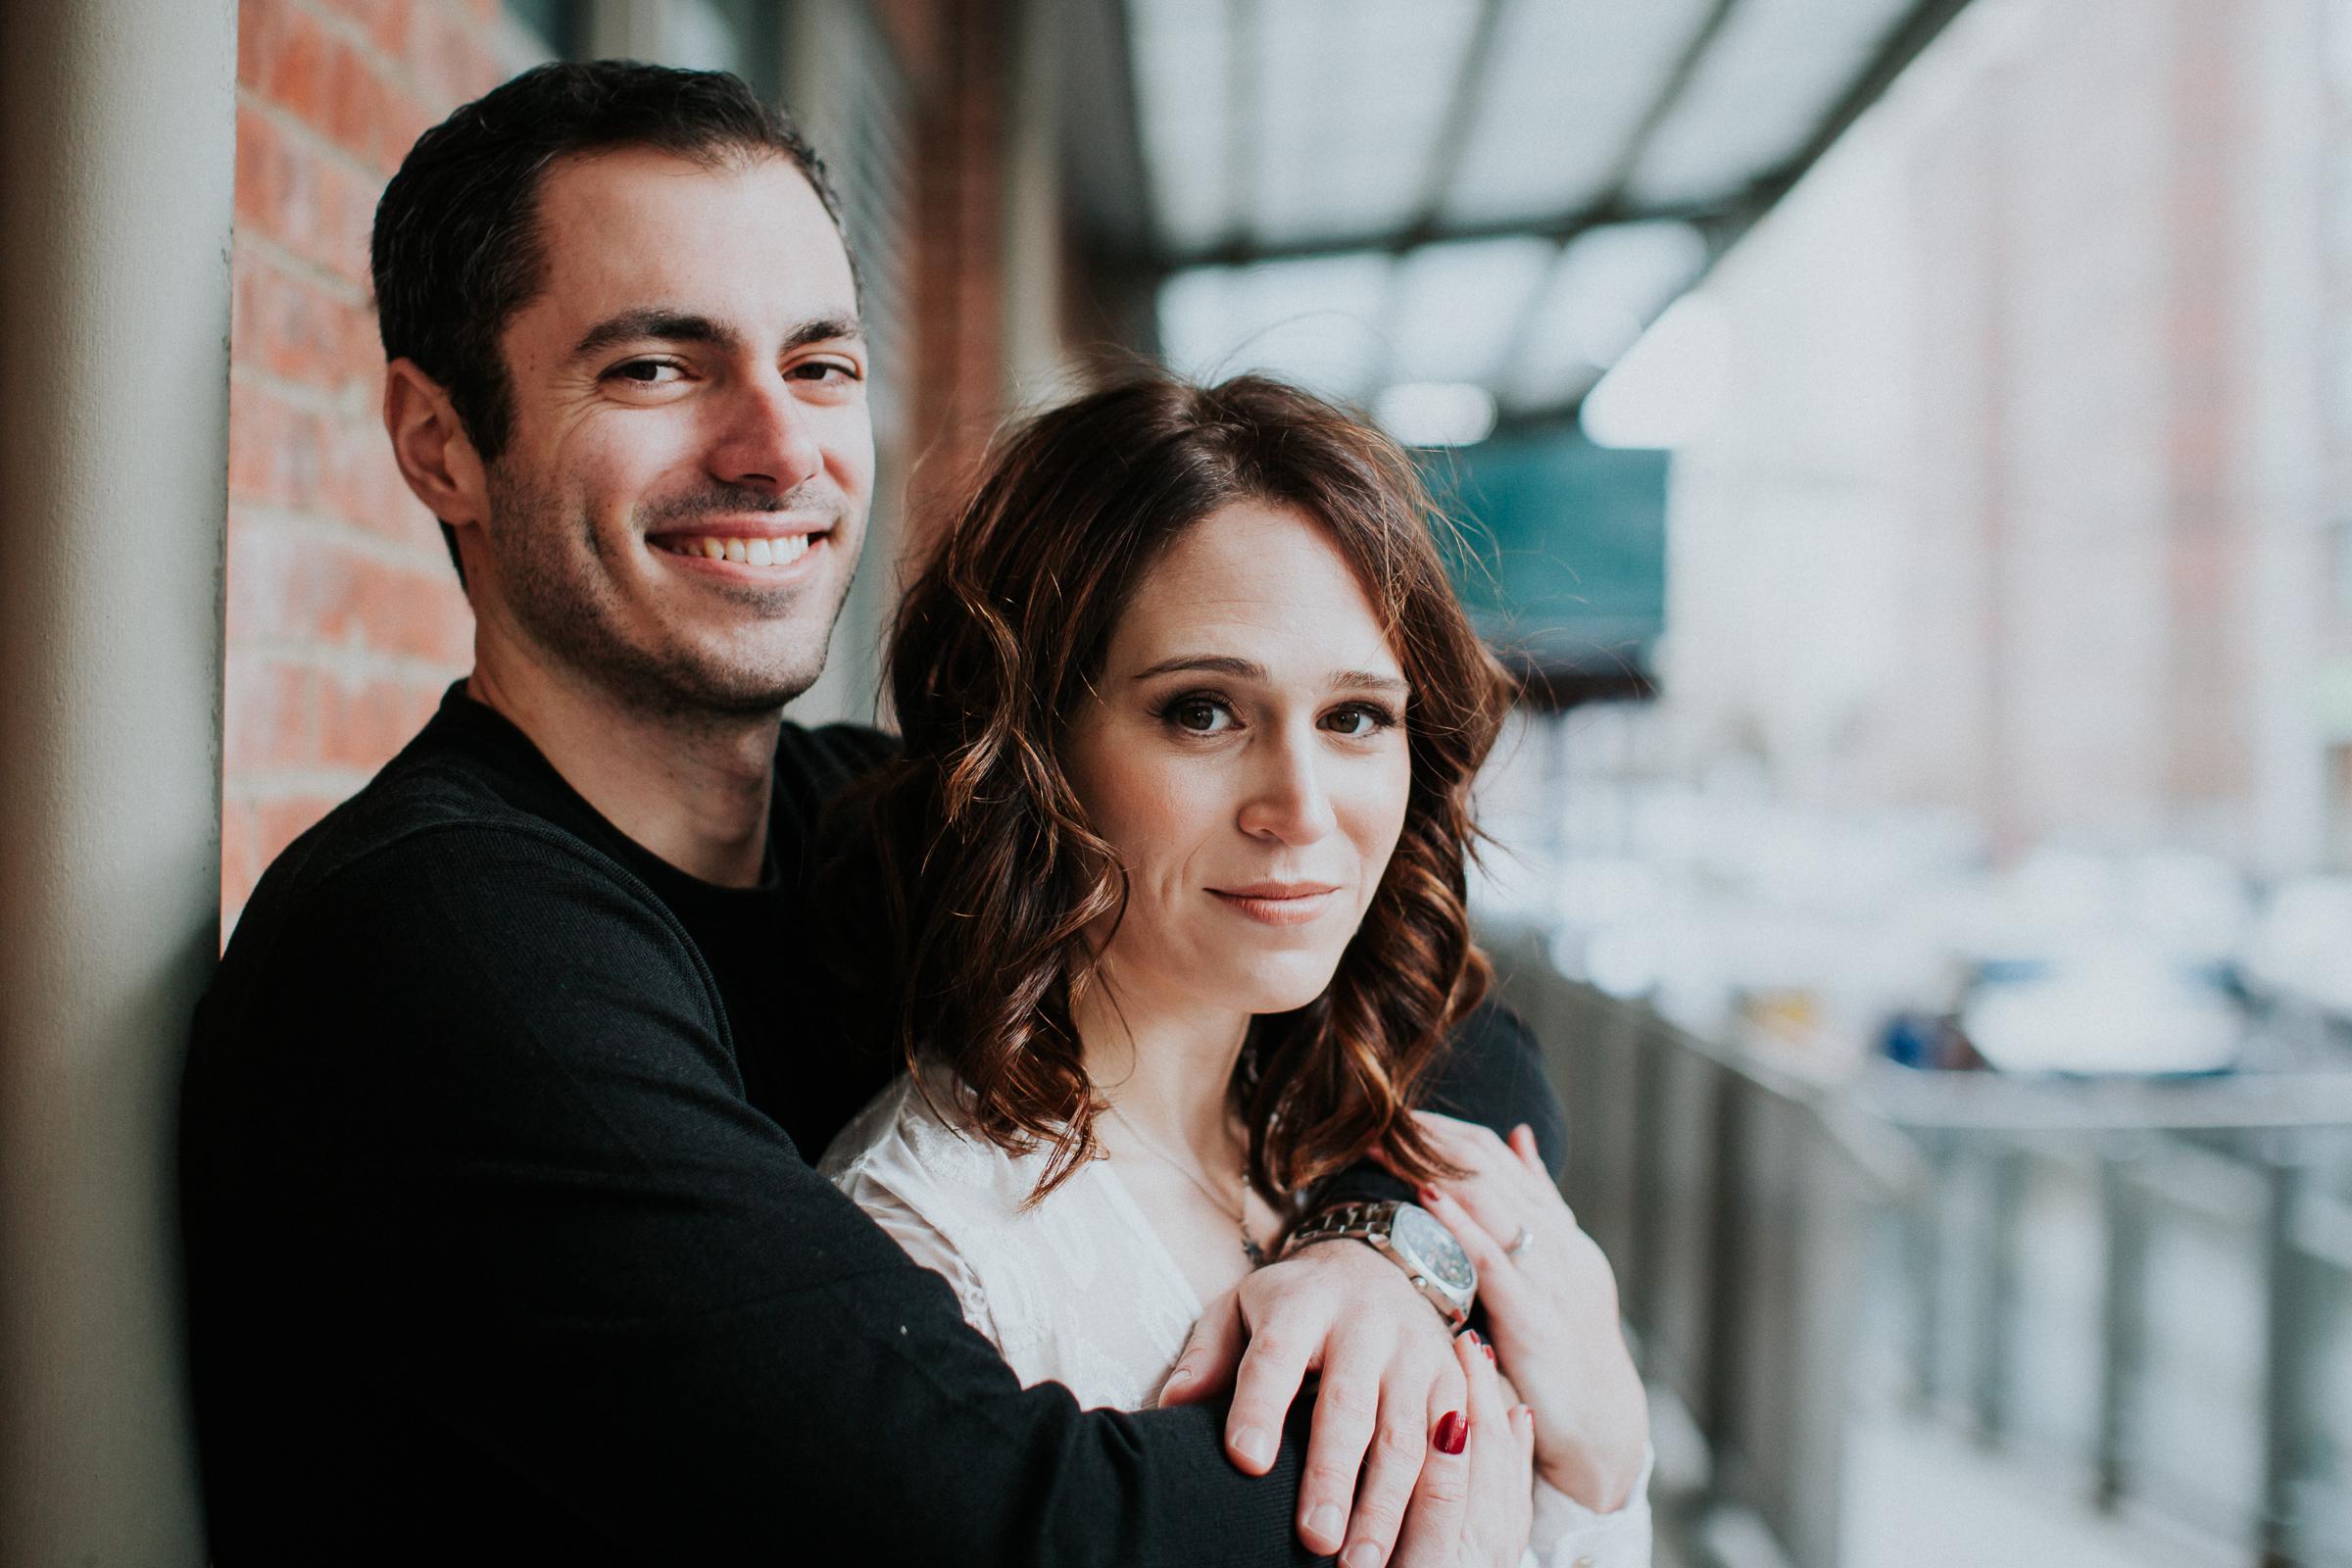 Jersey-City-Engagement-Photos-Documentary-Wedding-Photographer-NYC-15.jpg